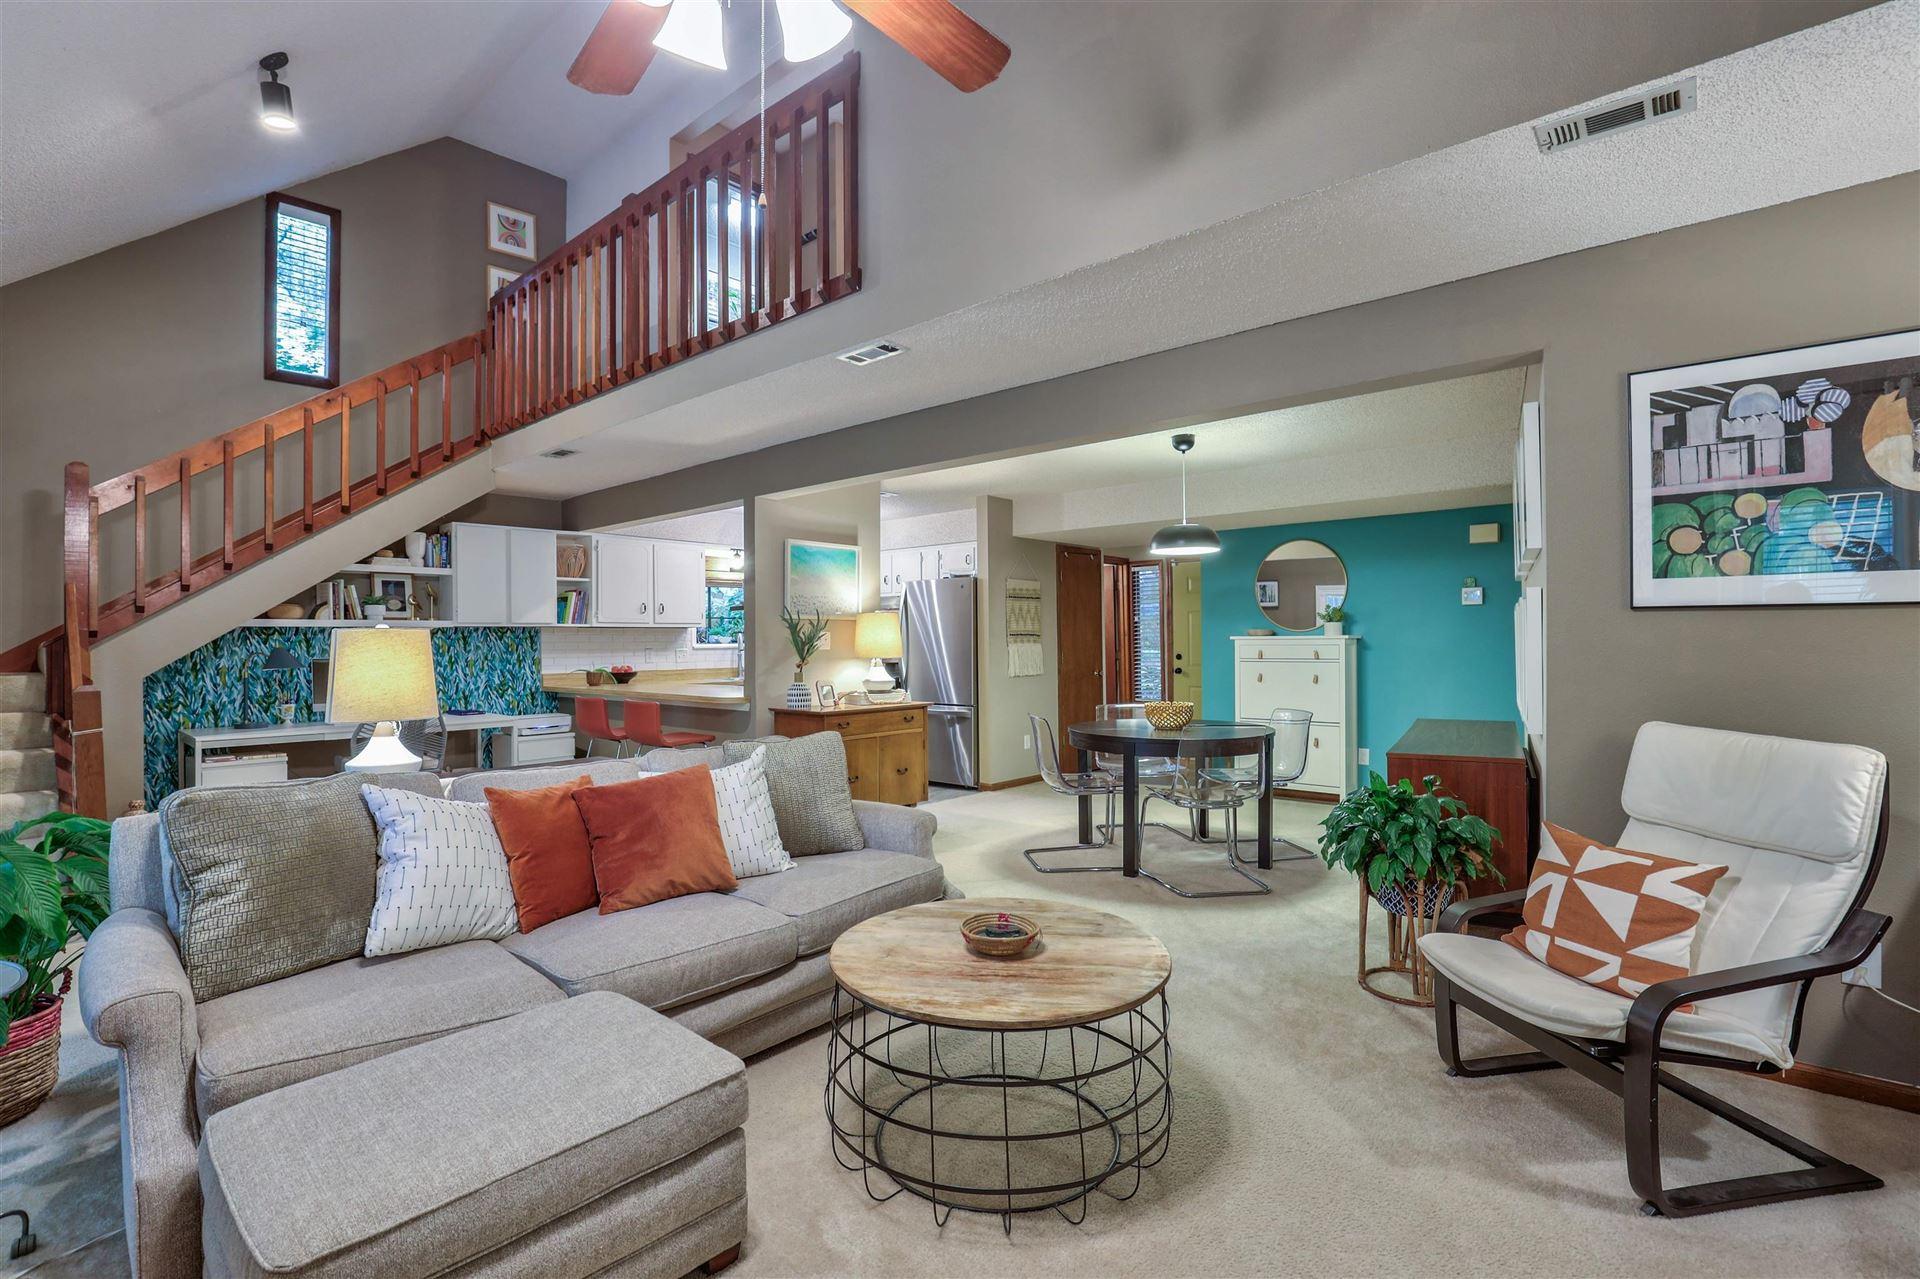 Photo of 2181 Shangri La Lane, TALLAHASSEE, FL 32303 (MLS # 337184)